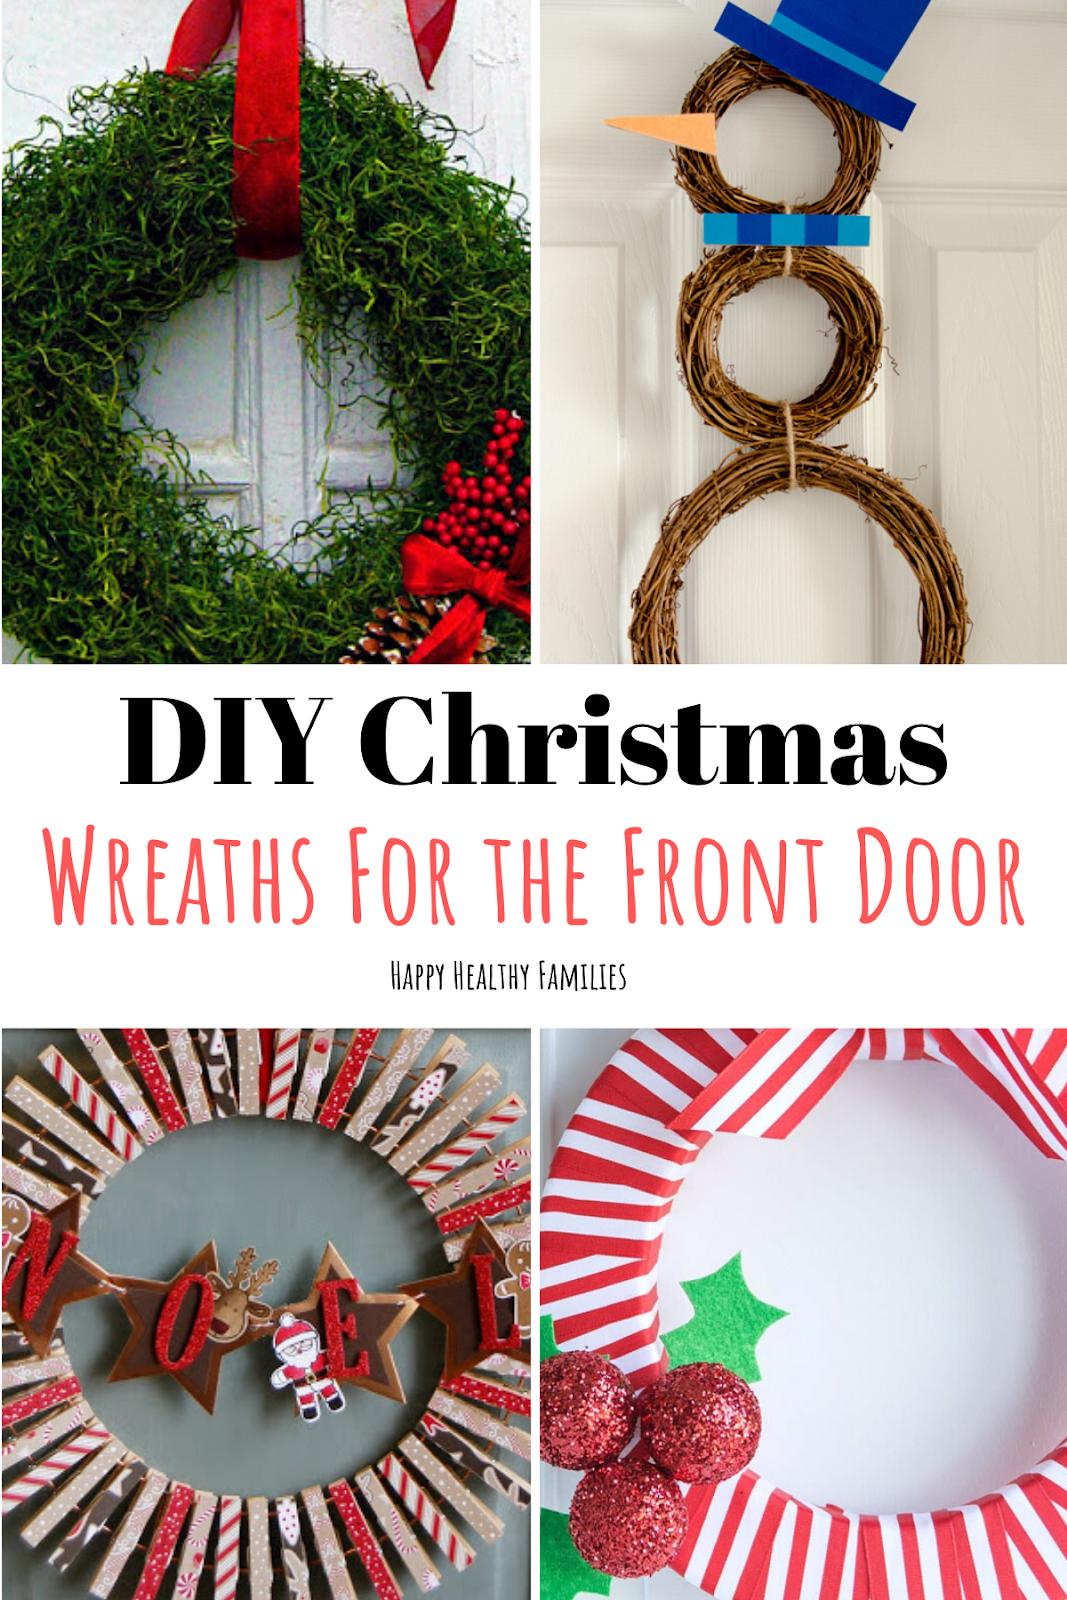 Happy Healthy Families 9 Easy Diy Front Door Christmas Wreath Ideas That Look Amazing